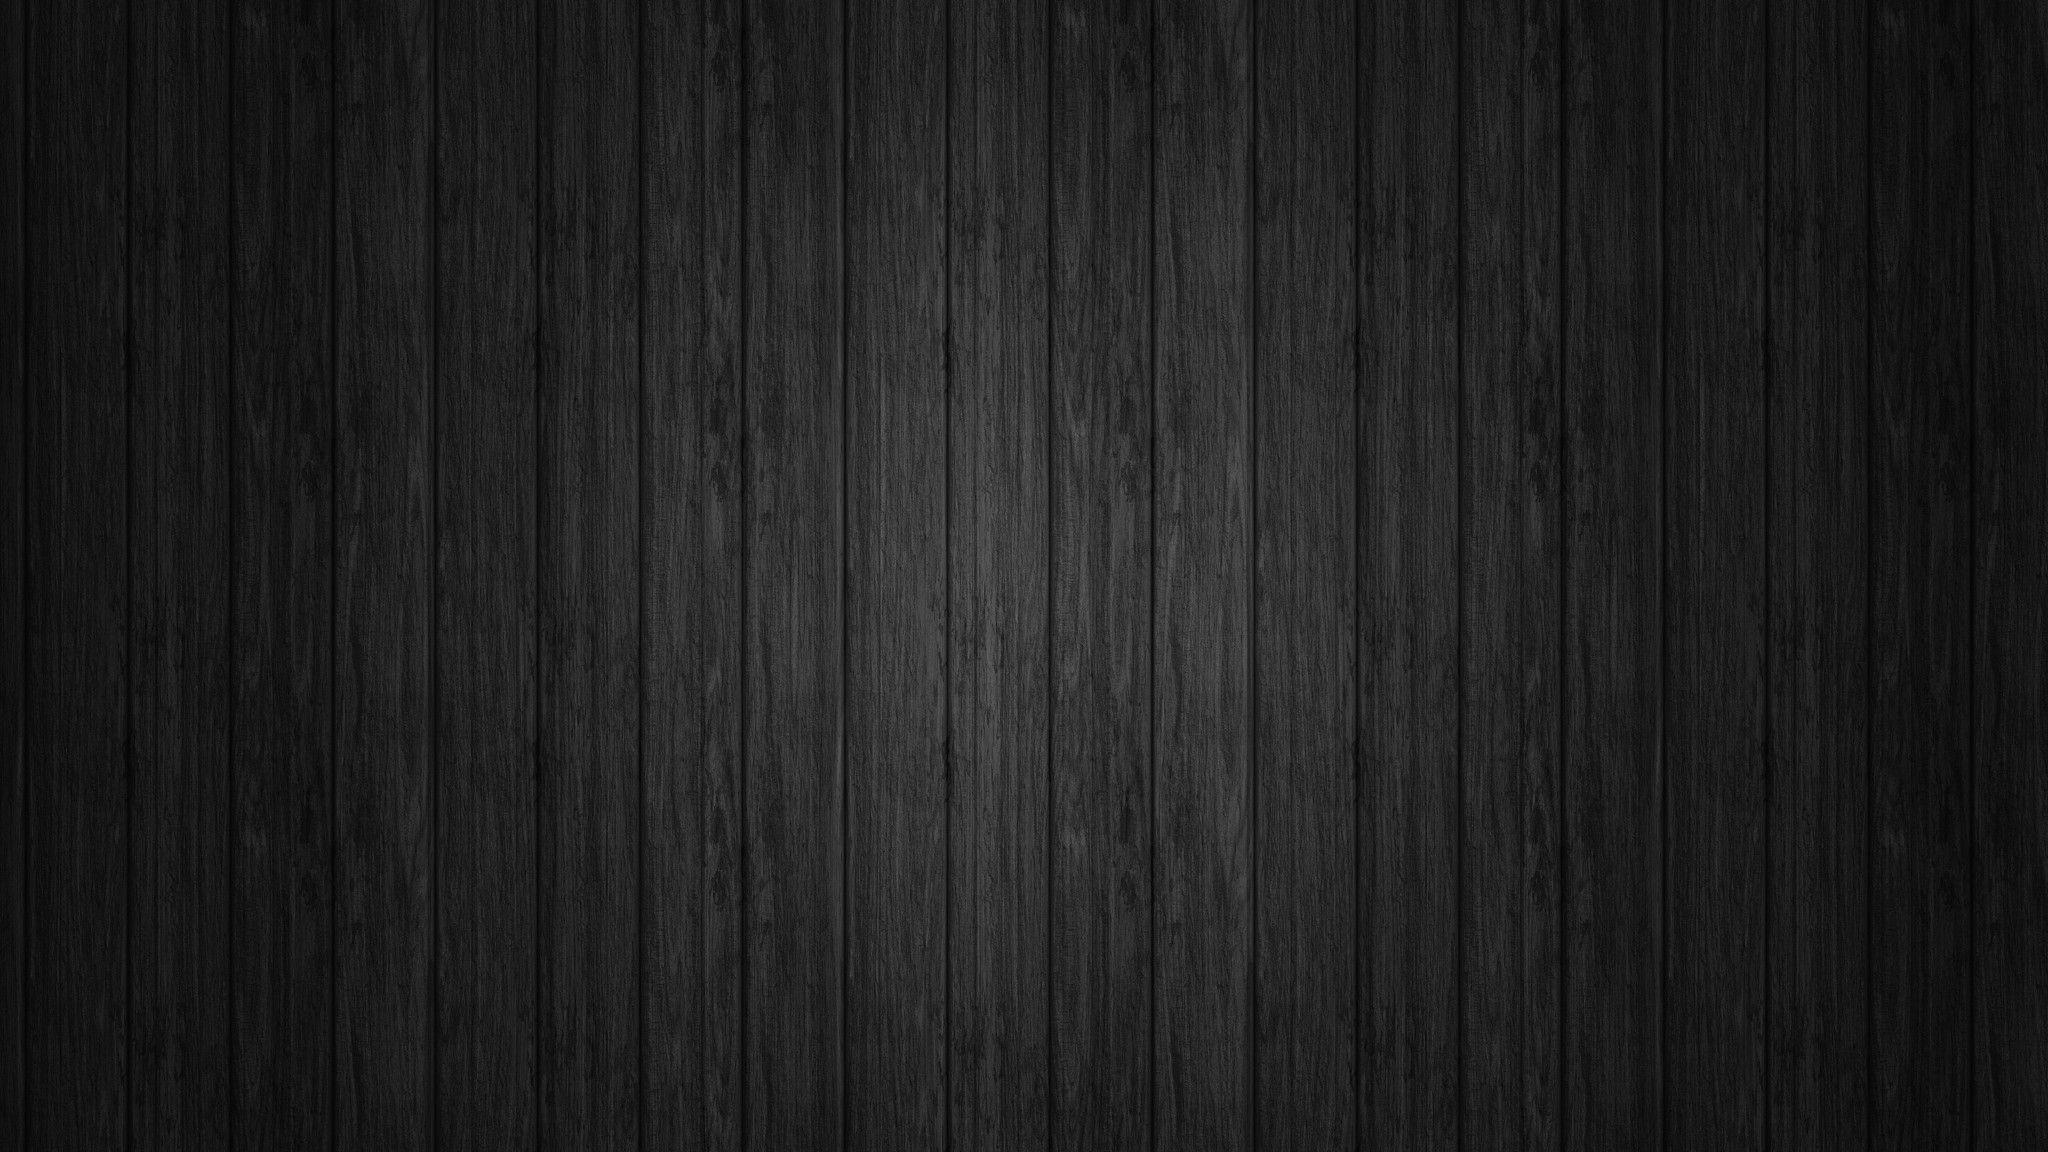 2048x1152 Wallpapers 83 Background Pictures Avec 85525 Et 2048